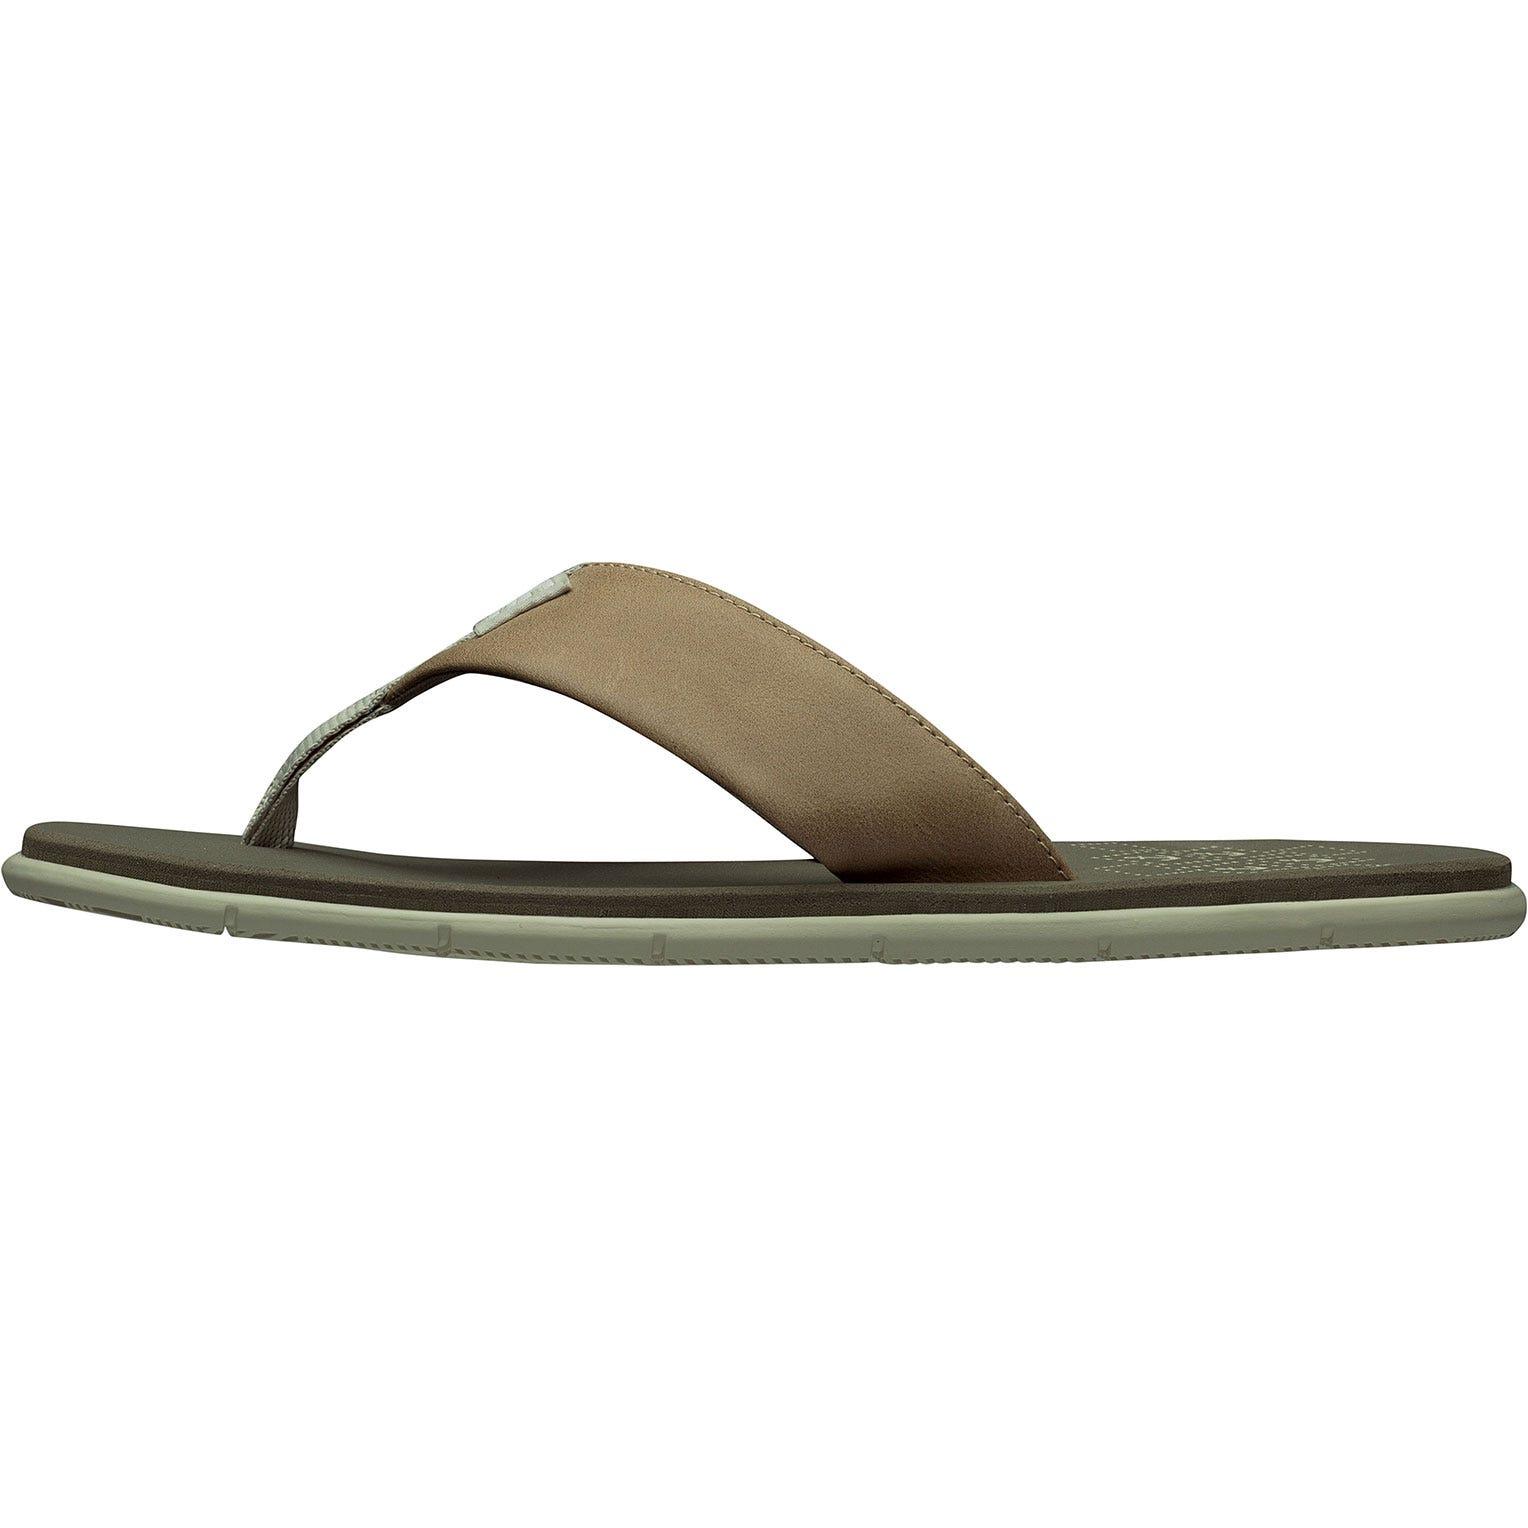 Helly Hansen W Seasand Leather Sandal Womens Beige 36/5